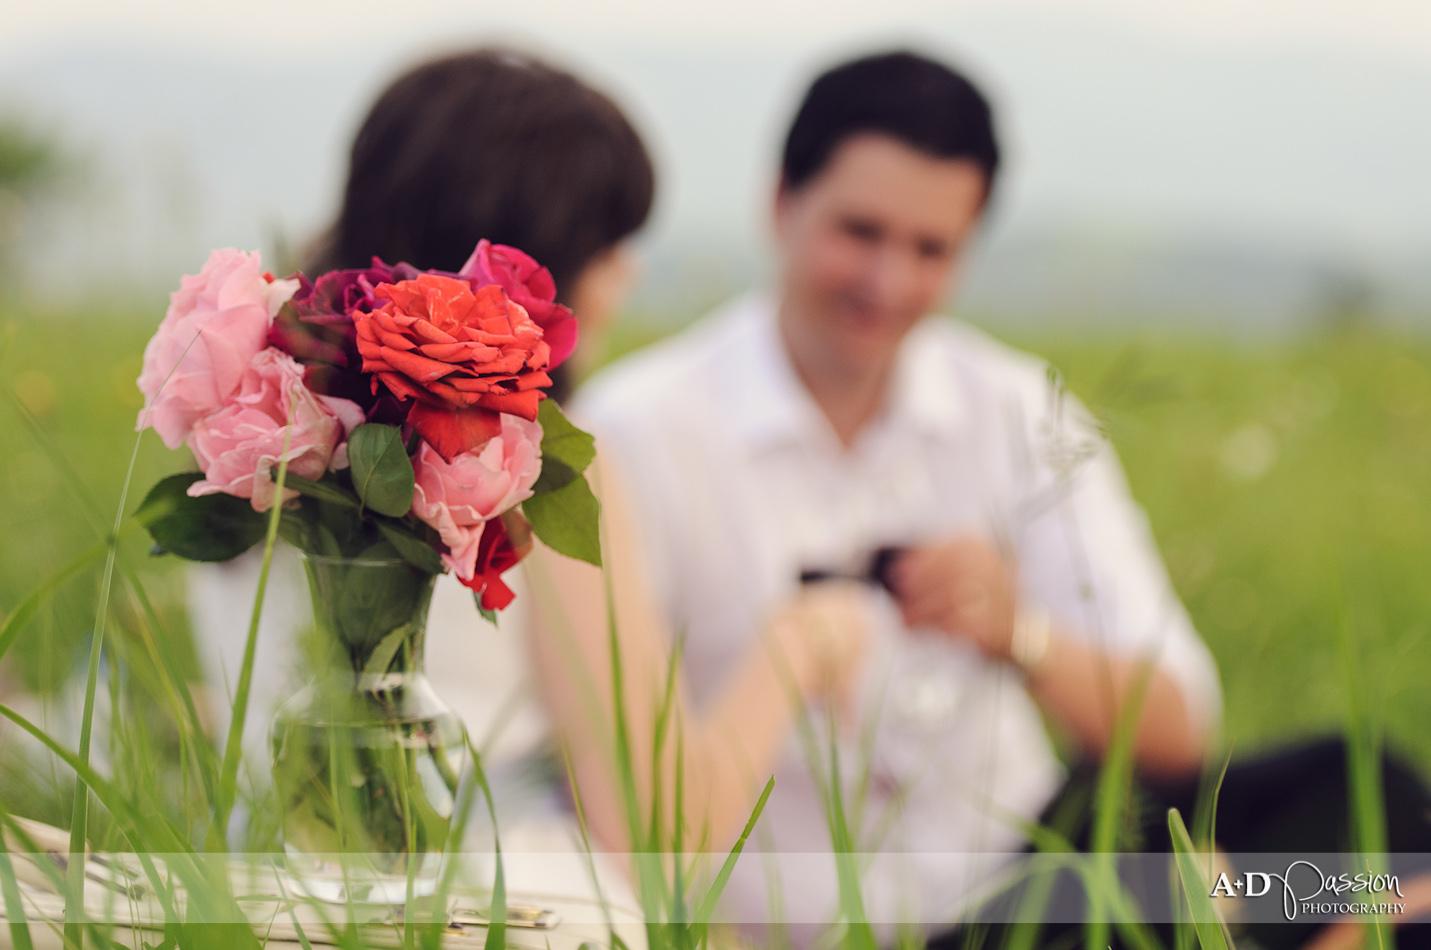 AD Passion Photography | 07042012_fotograf-profesionist-nunta_after-wedding_carmen-si-costi_0017 | Adelin, Dida, fotograf profesionist, fotograf de nunta, fotografie de nunta, fotograf Timisoara, fotograf Craiova, fotograf Bucuresti, fotograf Arad, nunta Timisoara, nunta Arad, nunta Bucuresti, nunta Craiova